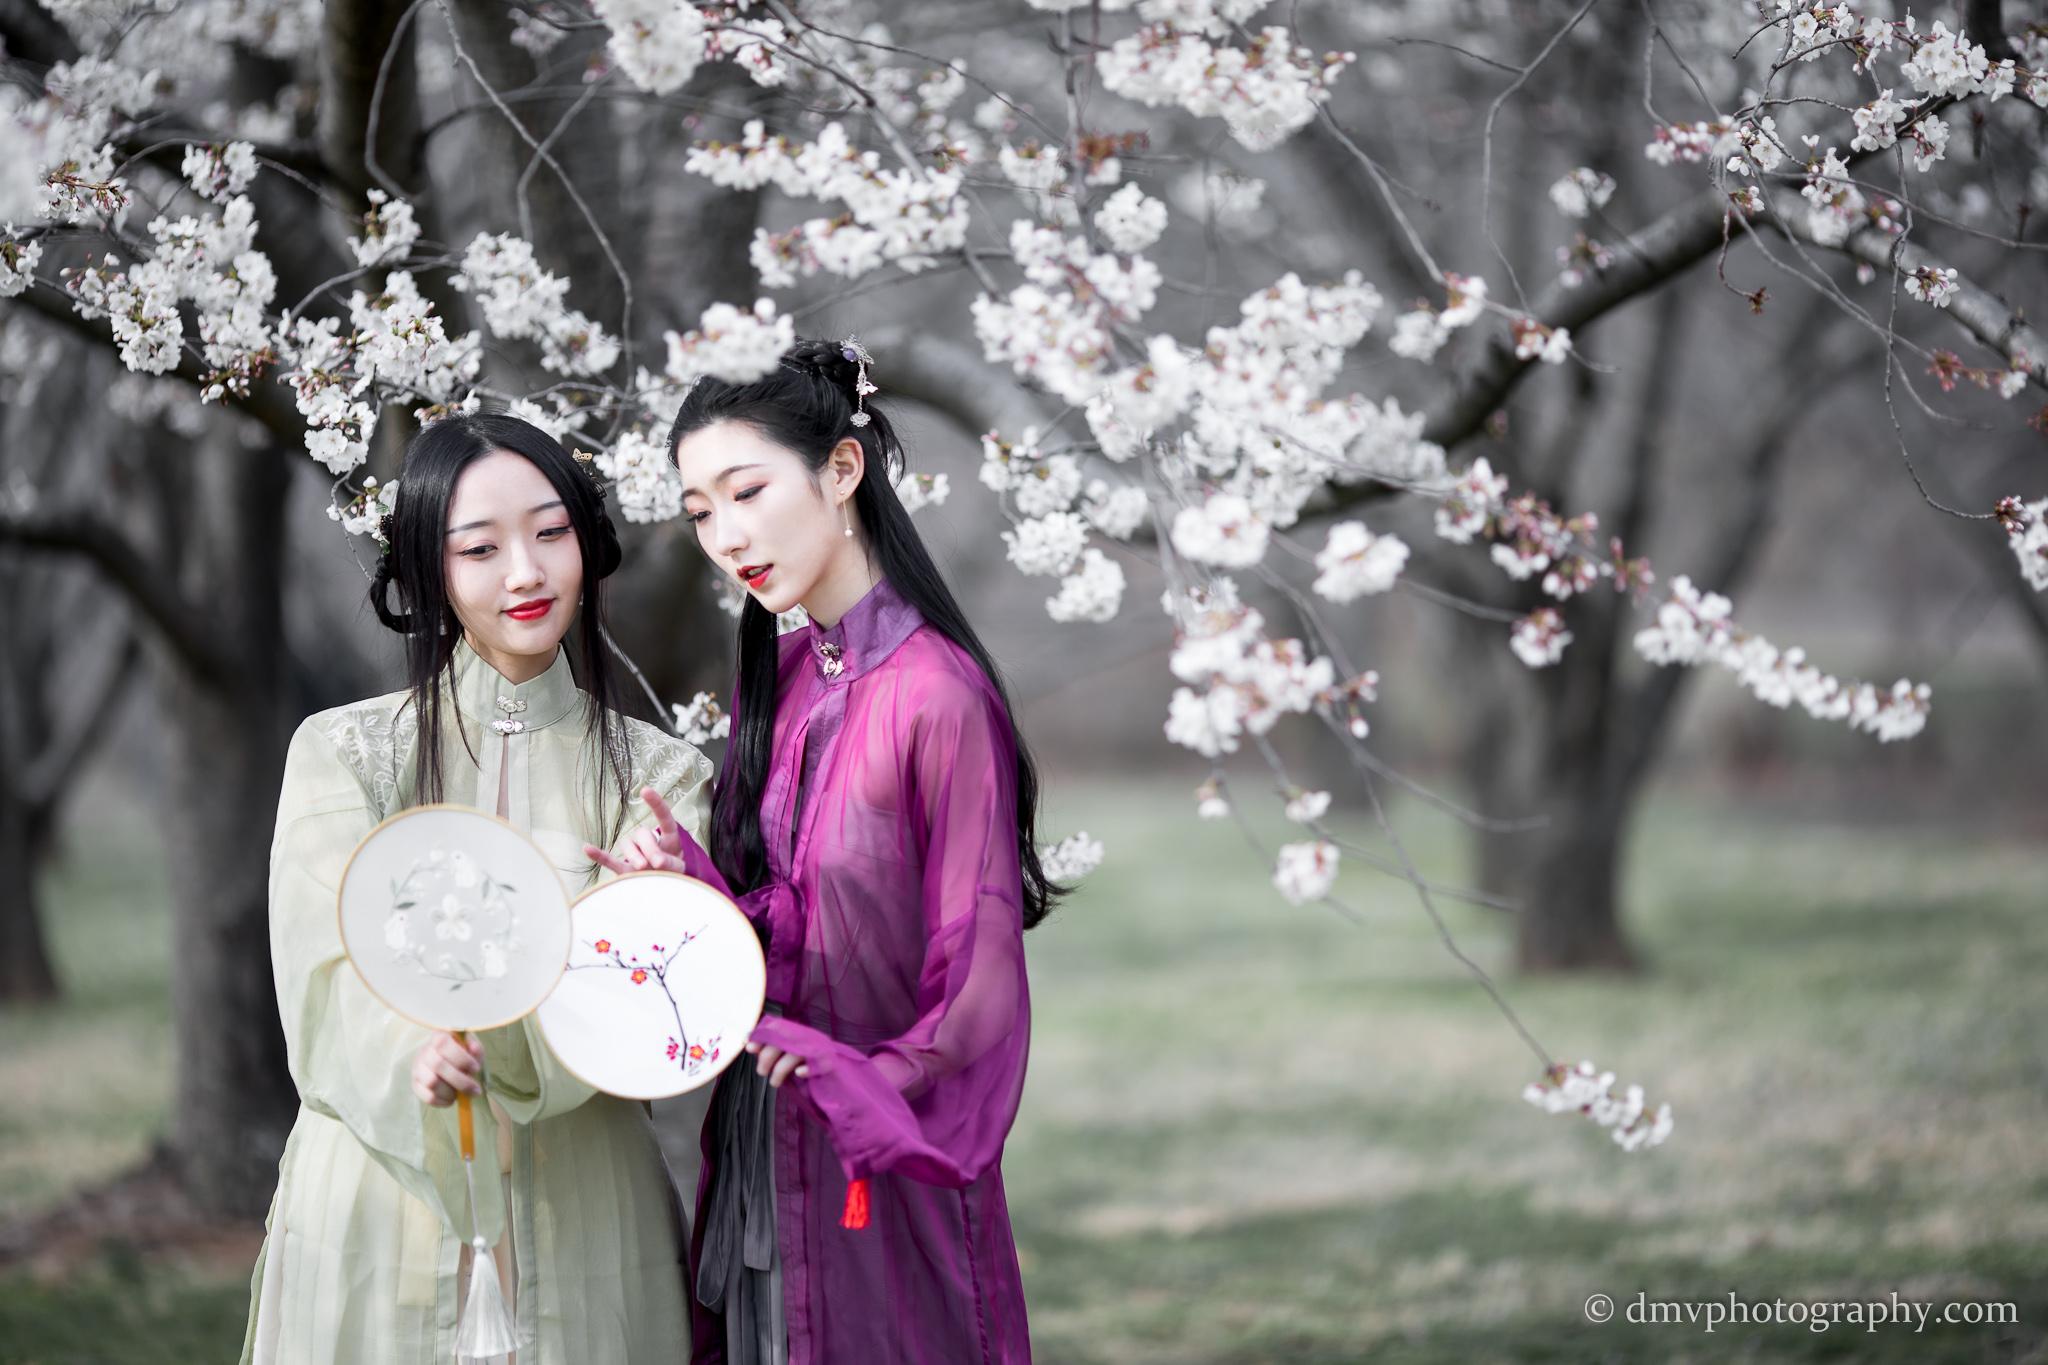 2017-03-25 - Day Cherry Blossom - 00009